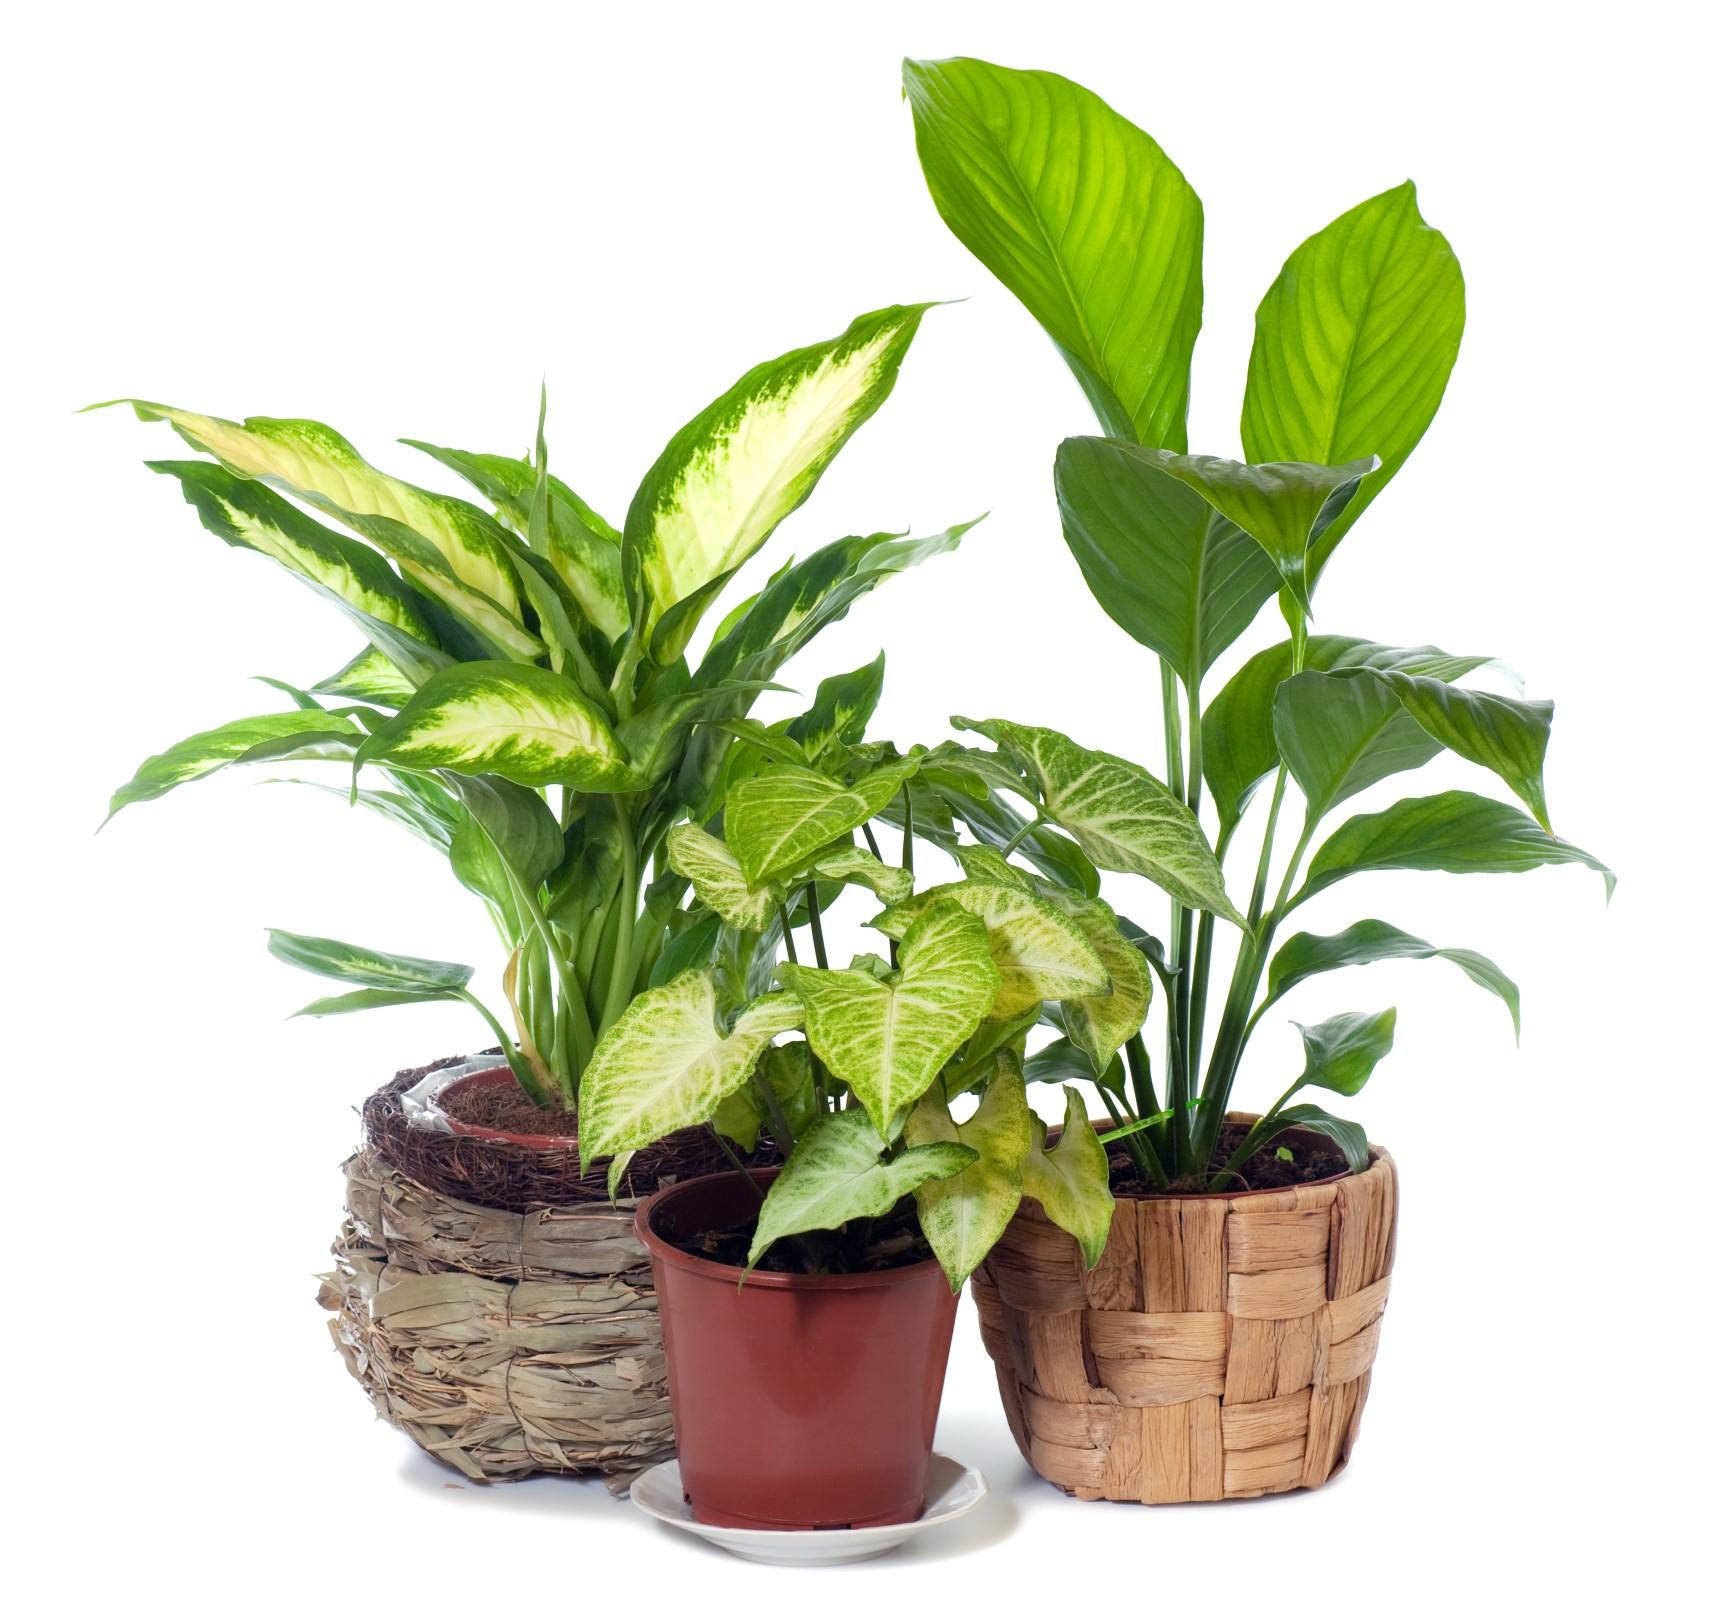 Tre forskjellige stueplanter, alle med grønne blader. To med ovale blader, grønne kanter og hvitgule blader og en med ovale, grønne blader